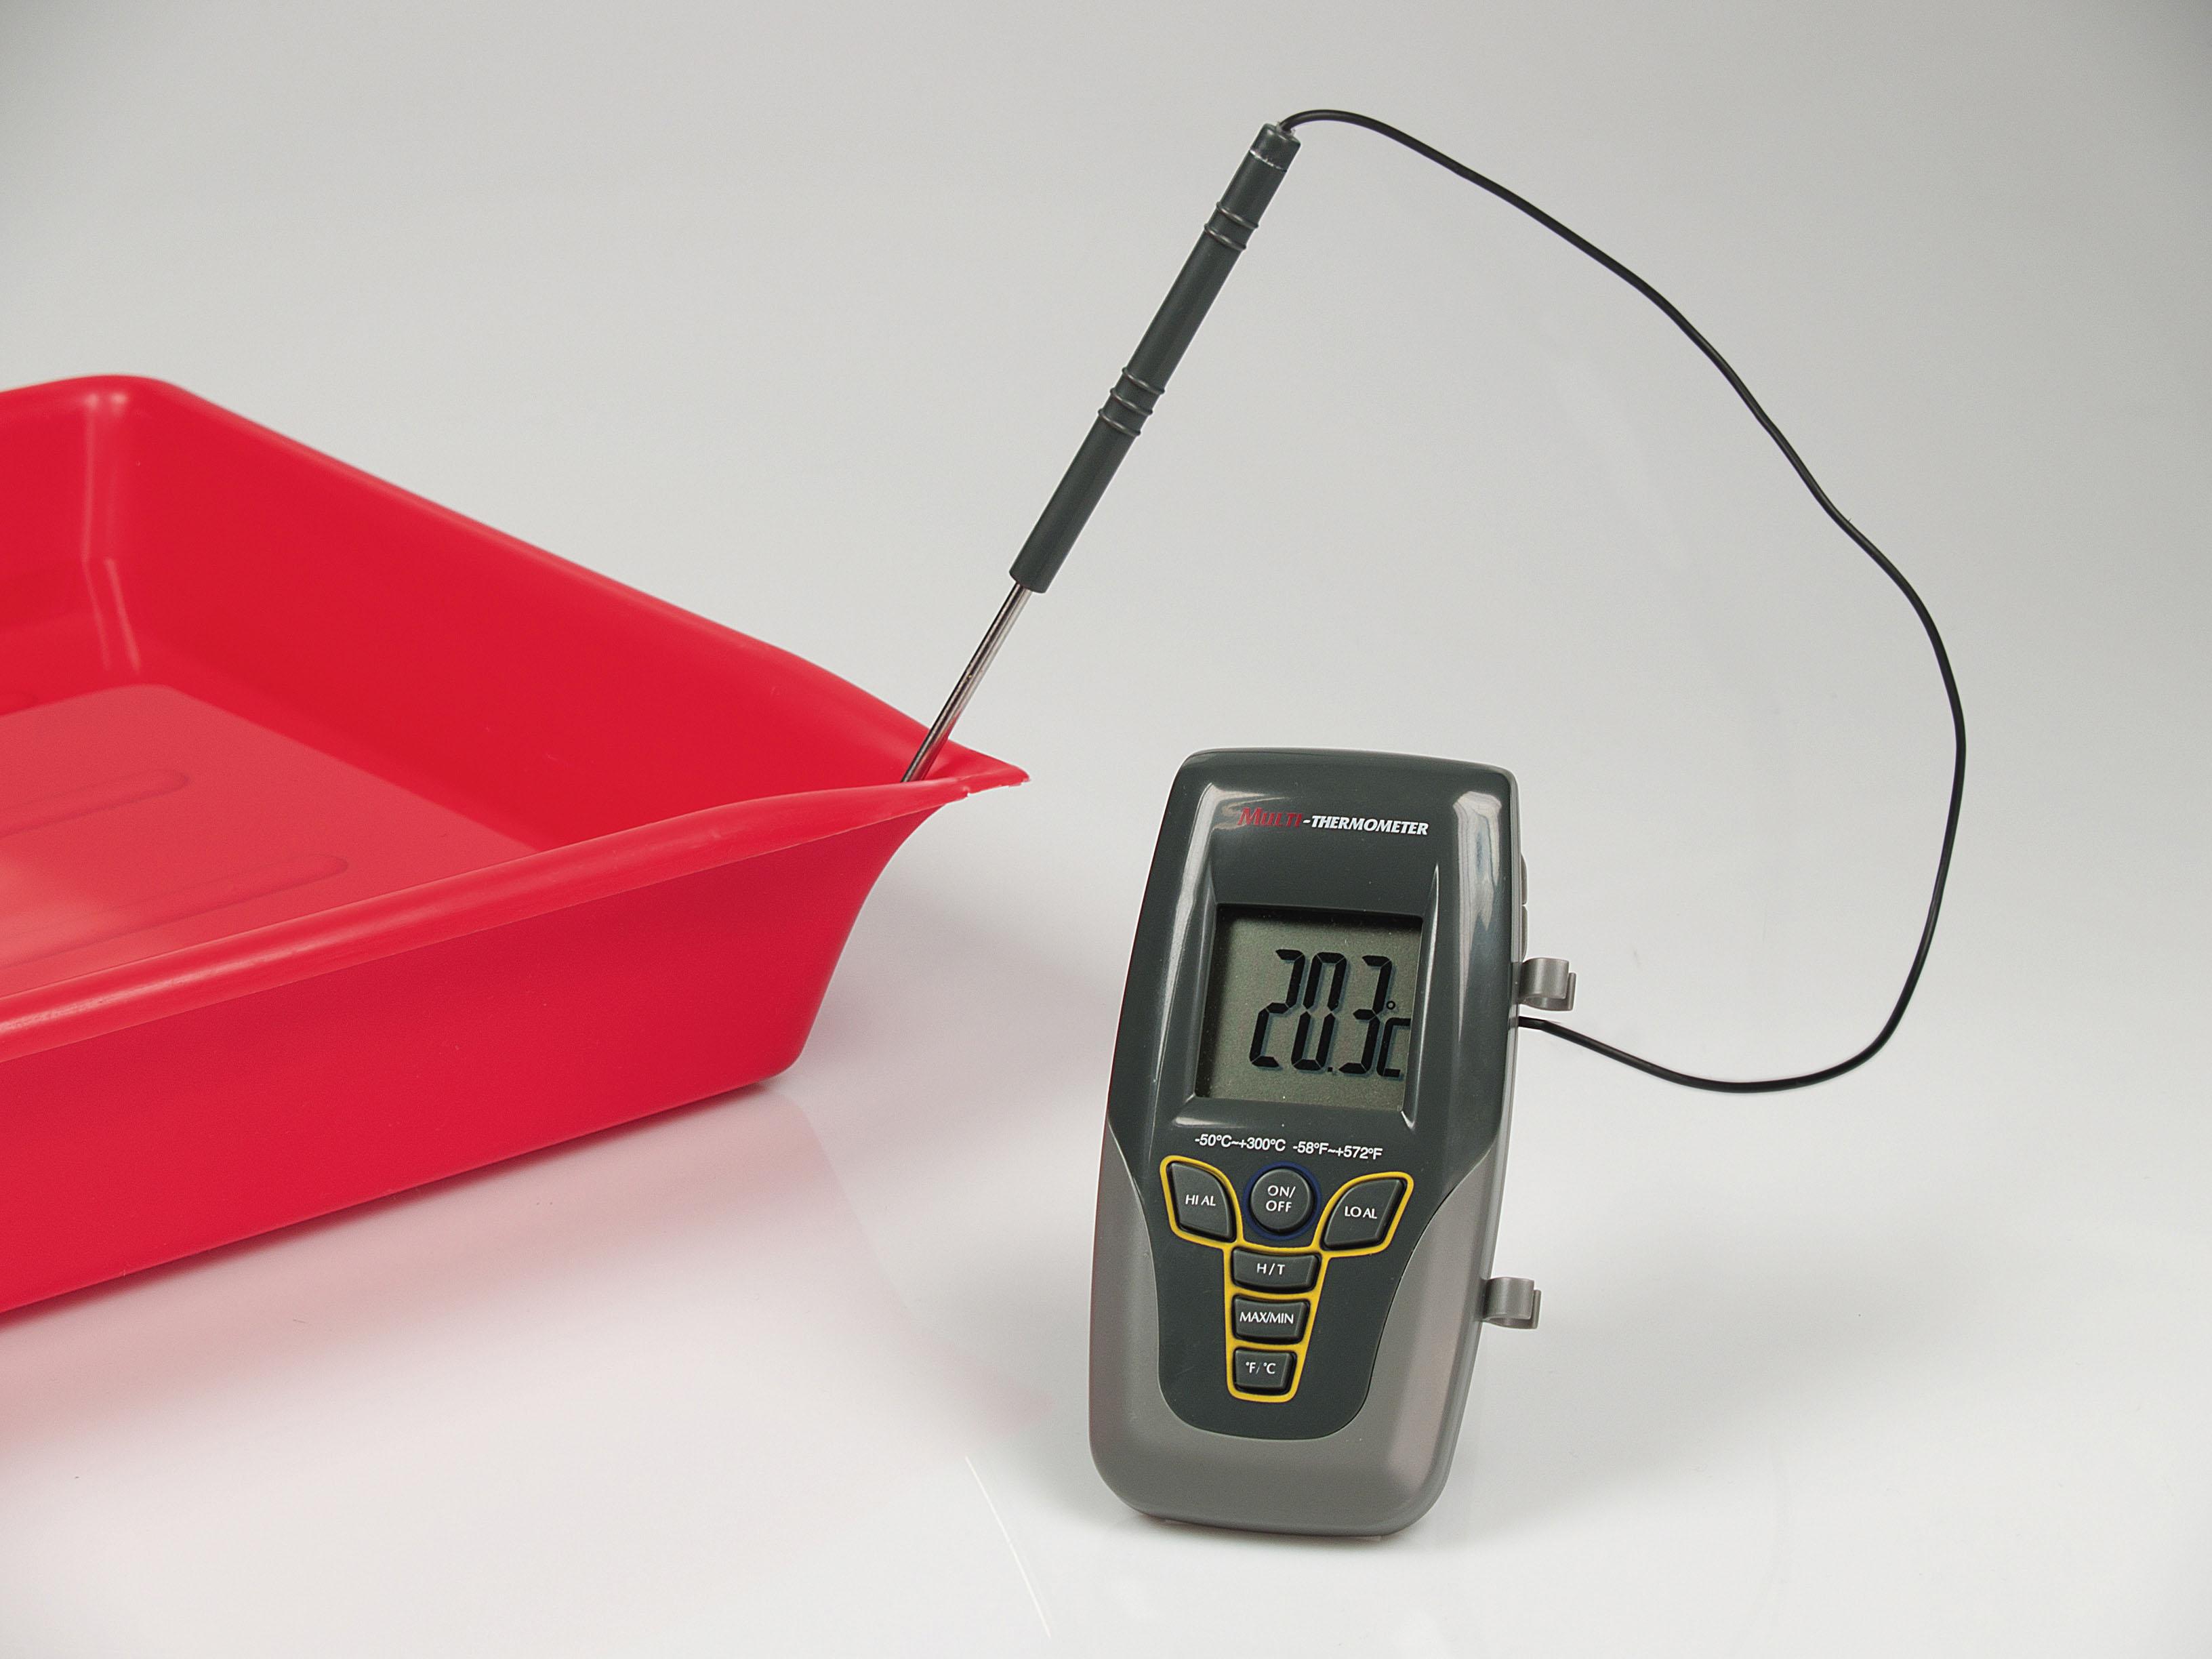 KAISER Digital-Thermometer